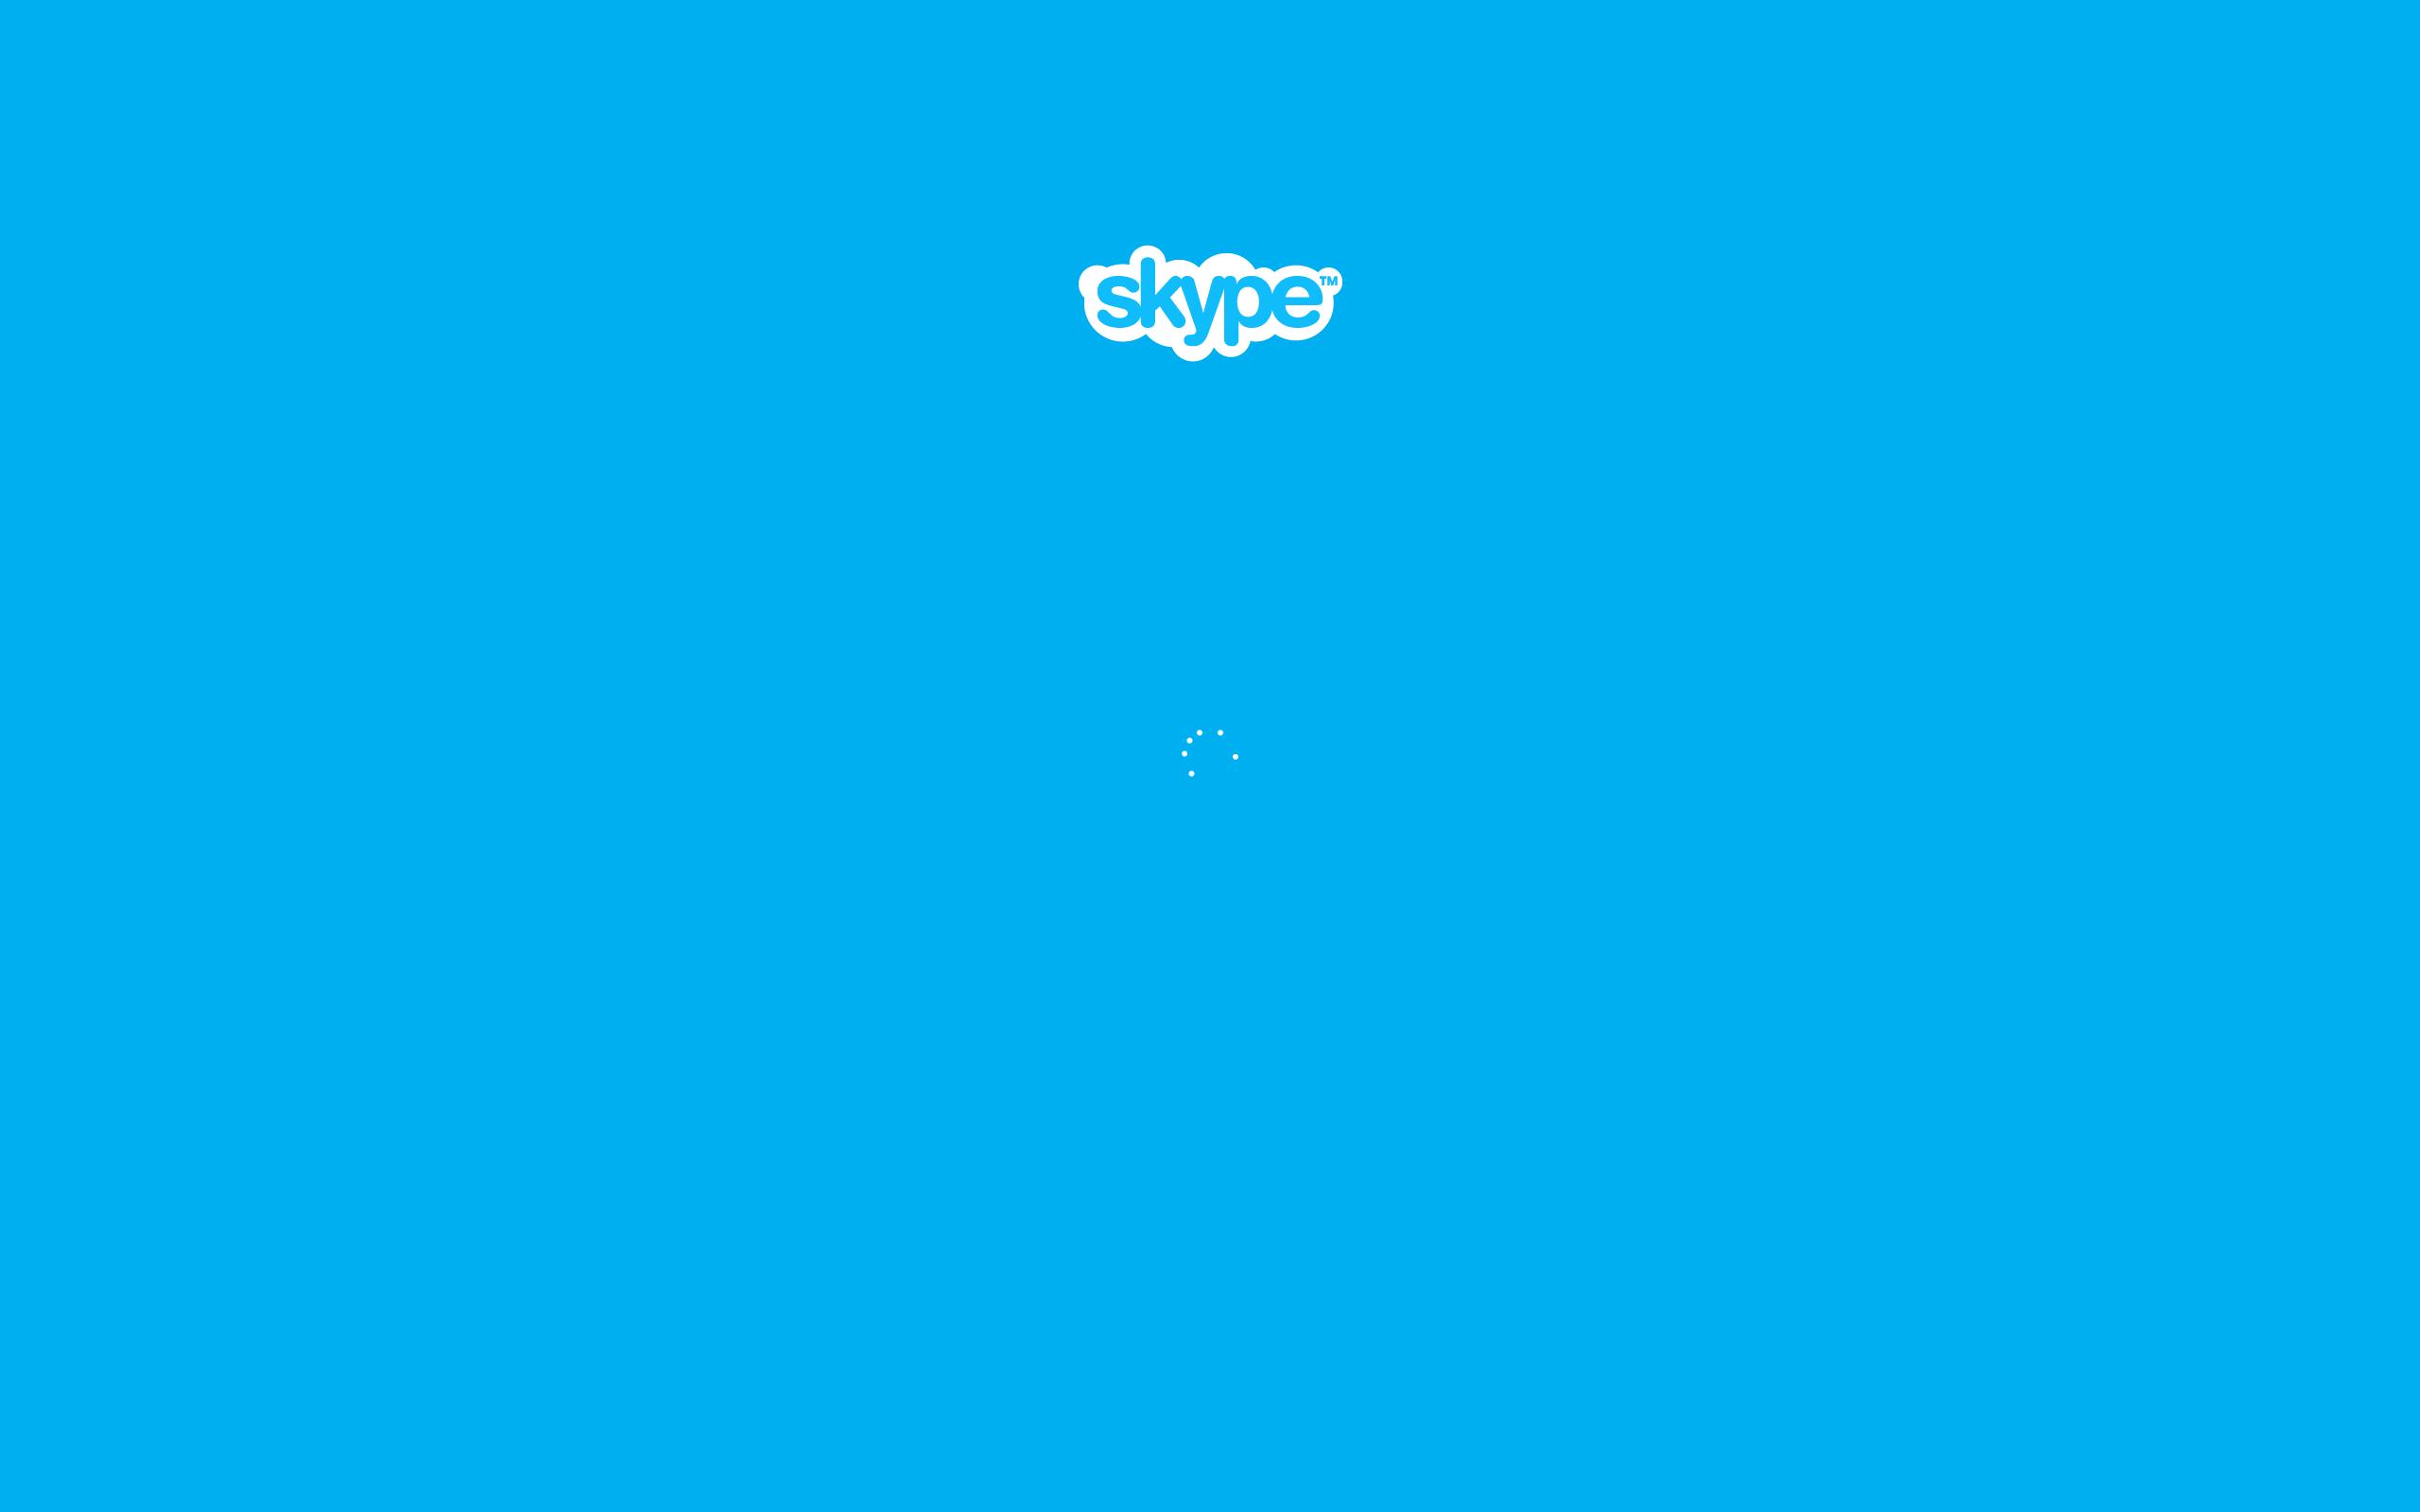 Skype Wallpaper 7